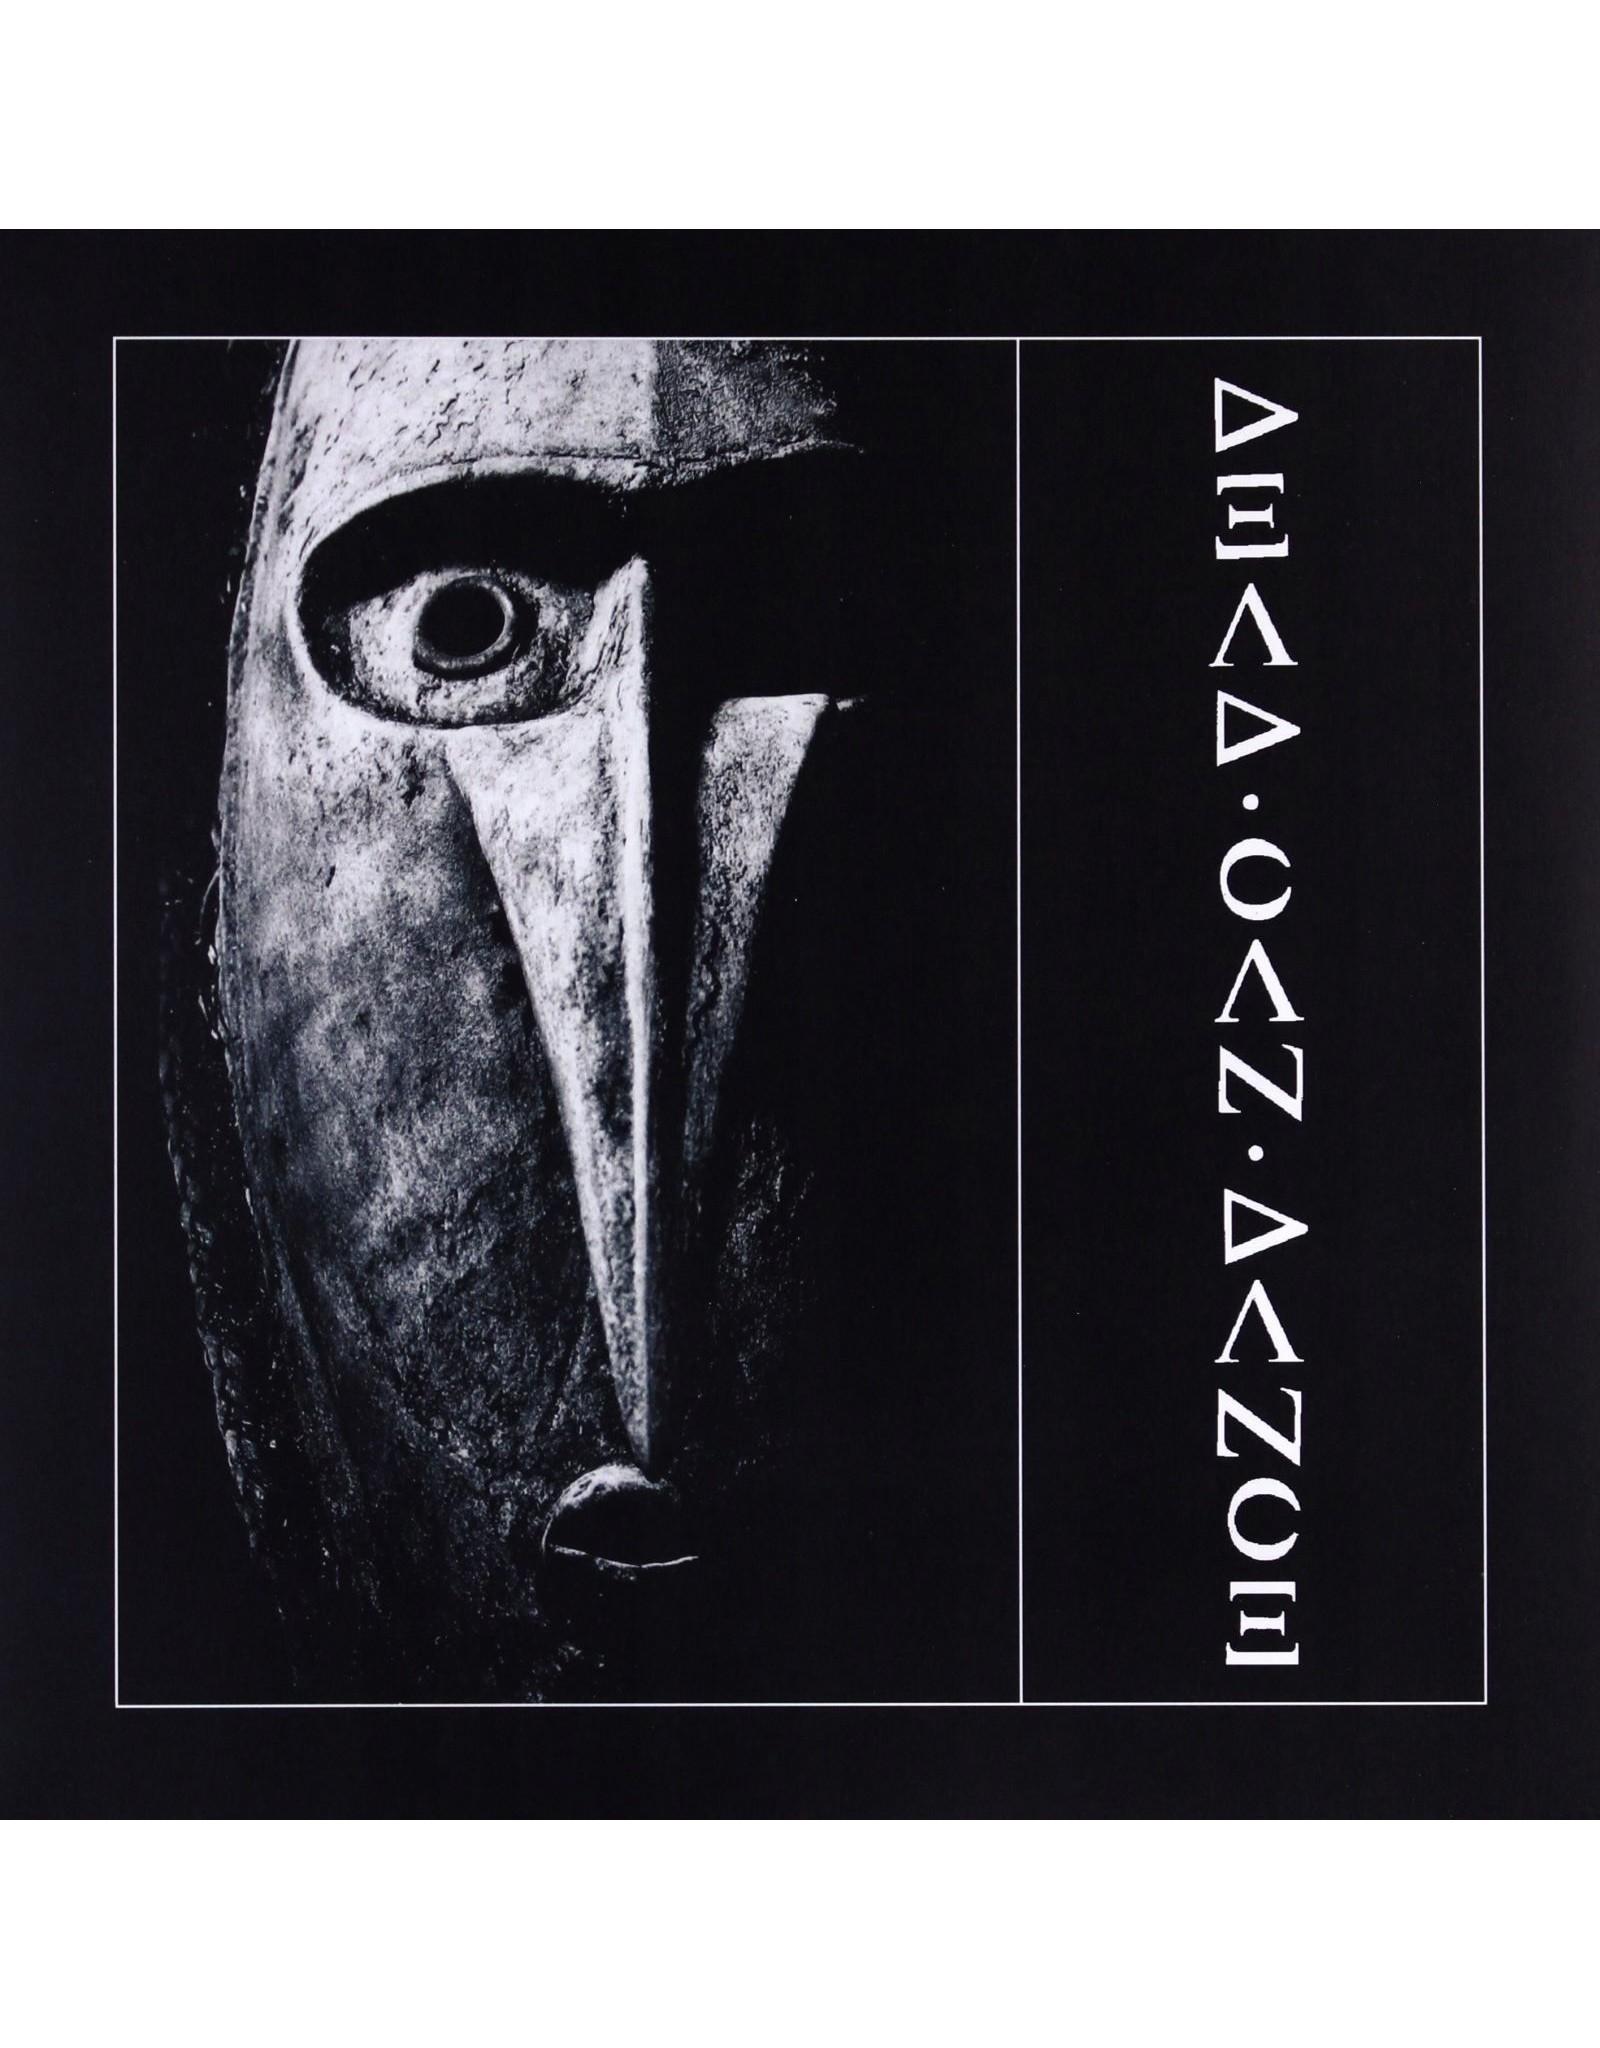 New Vinyl Dead Can Dance - S/T LP